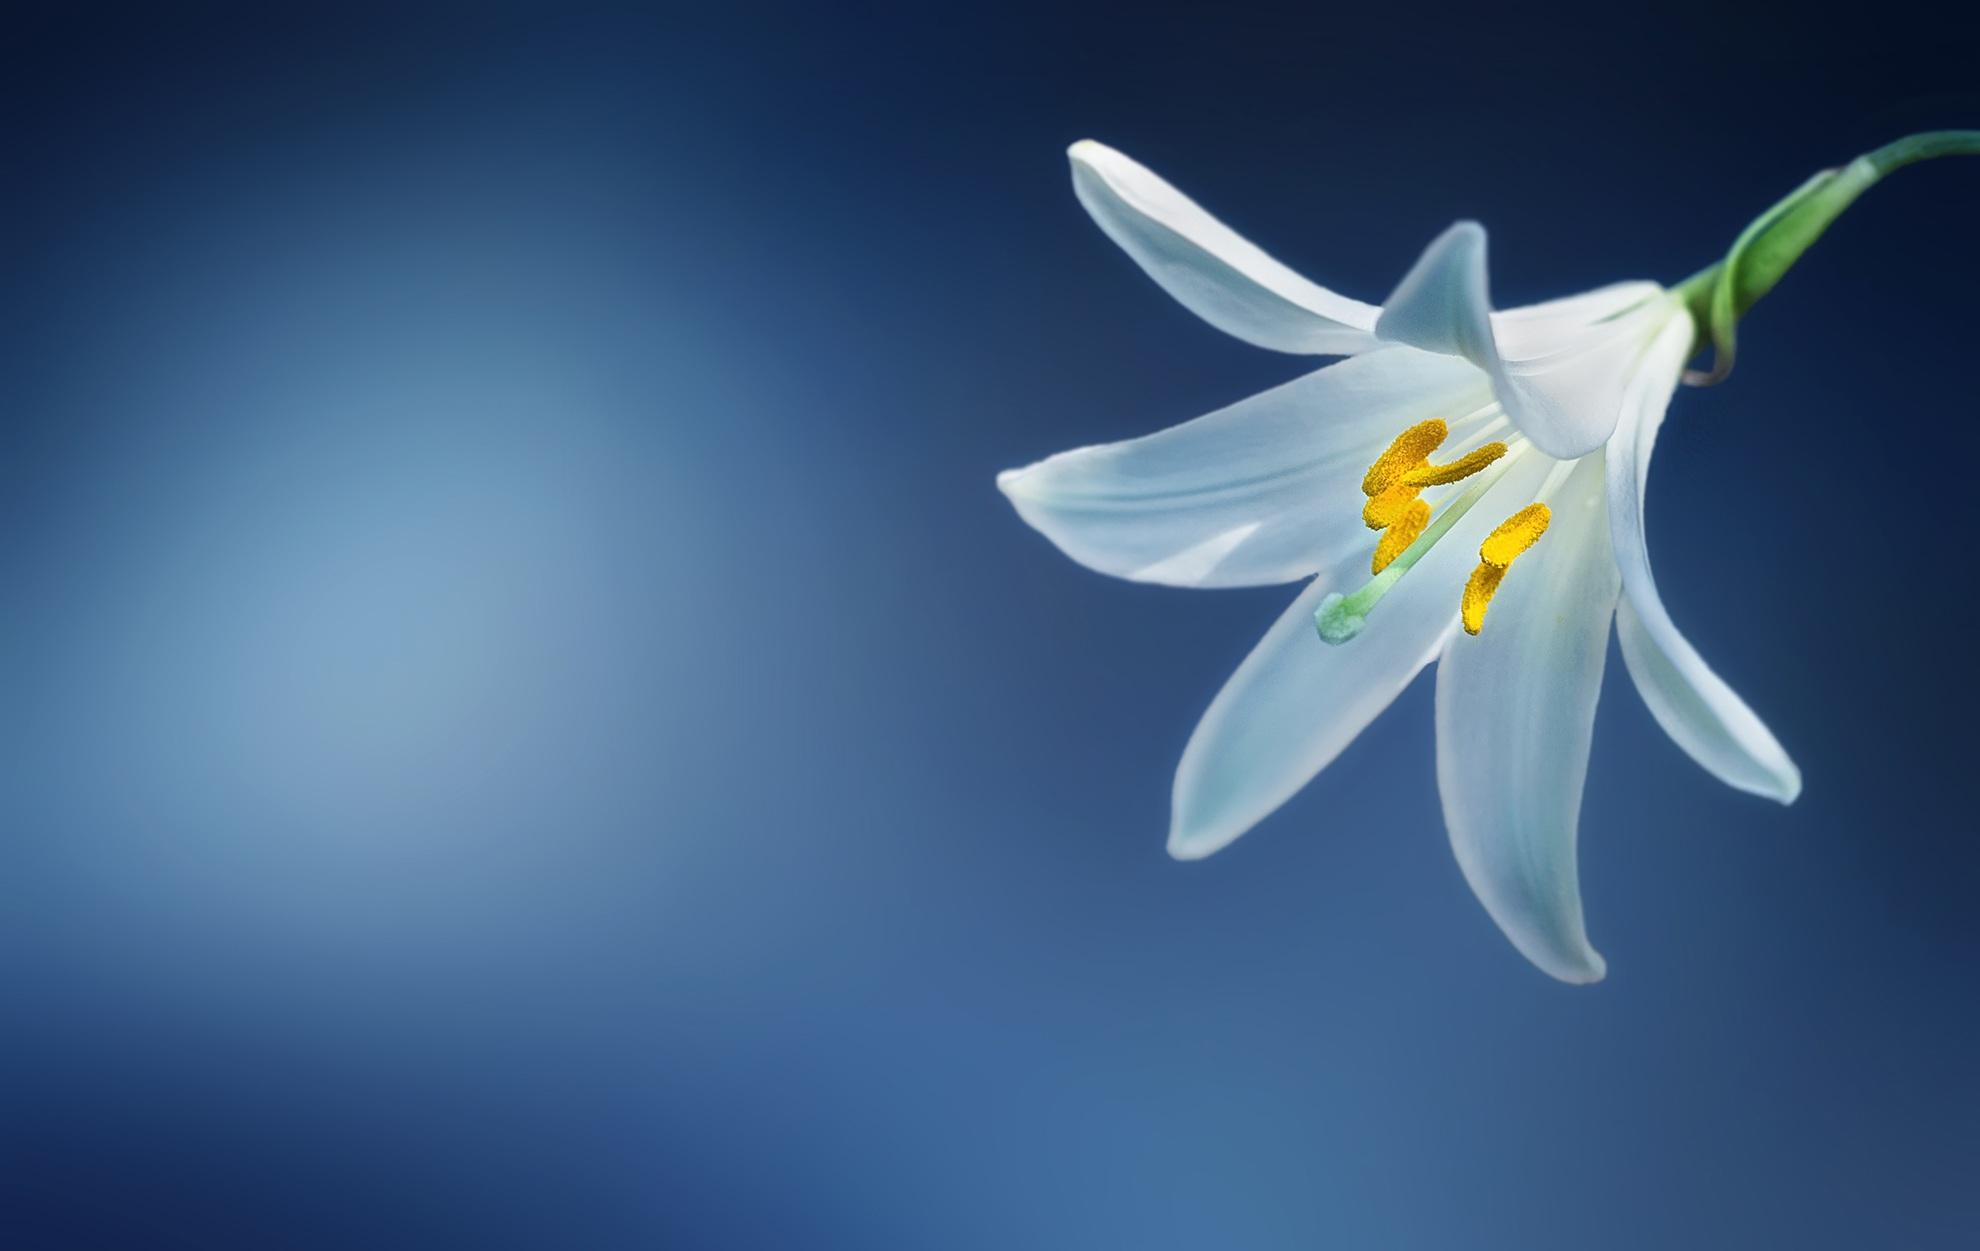 flower-lily-lilium-candidum-madonna-lily.jpg (1980×1251)